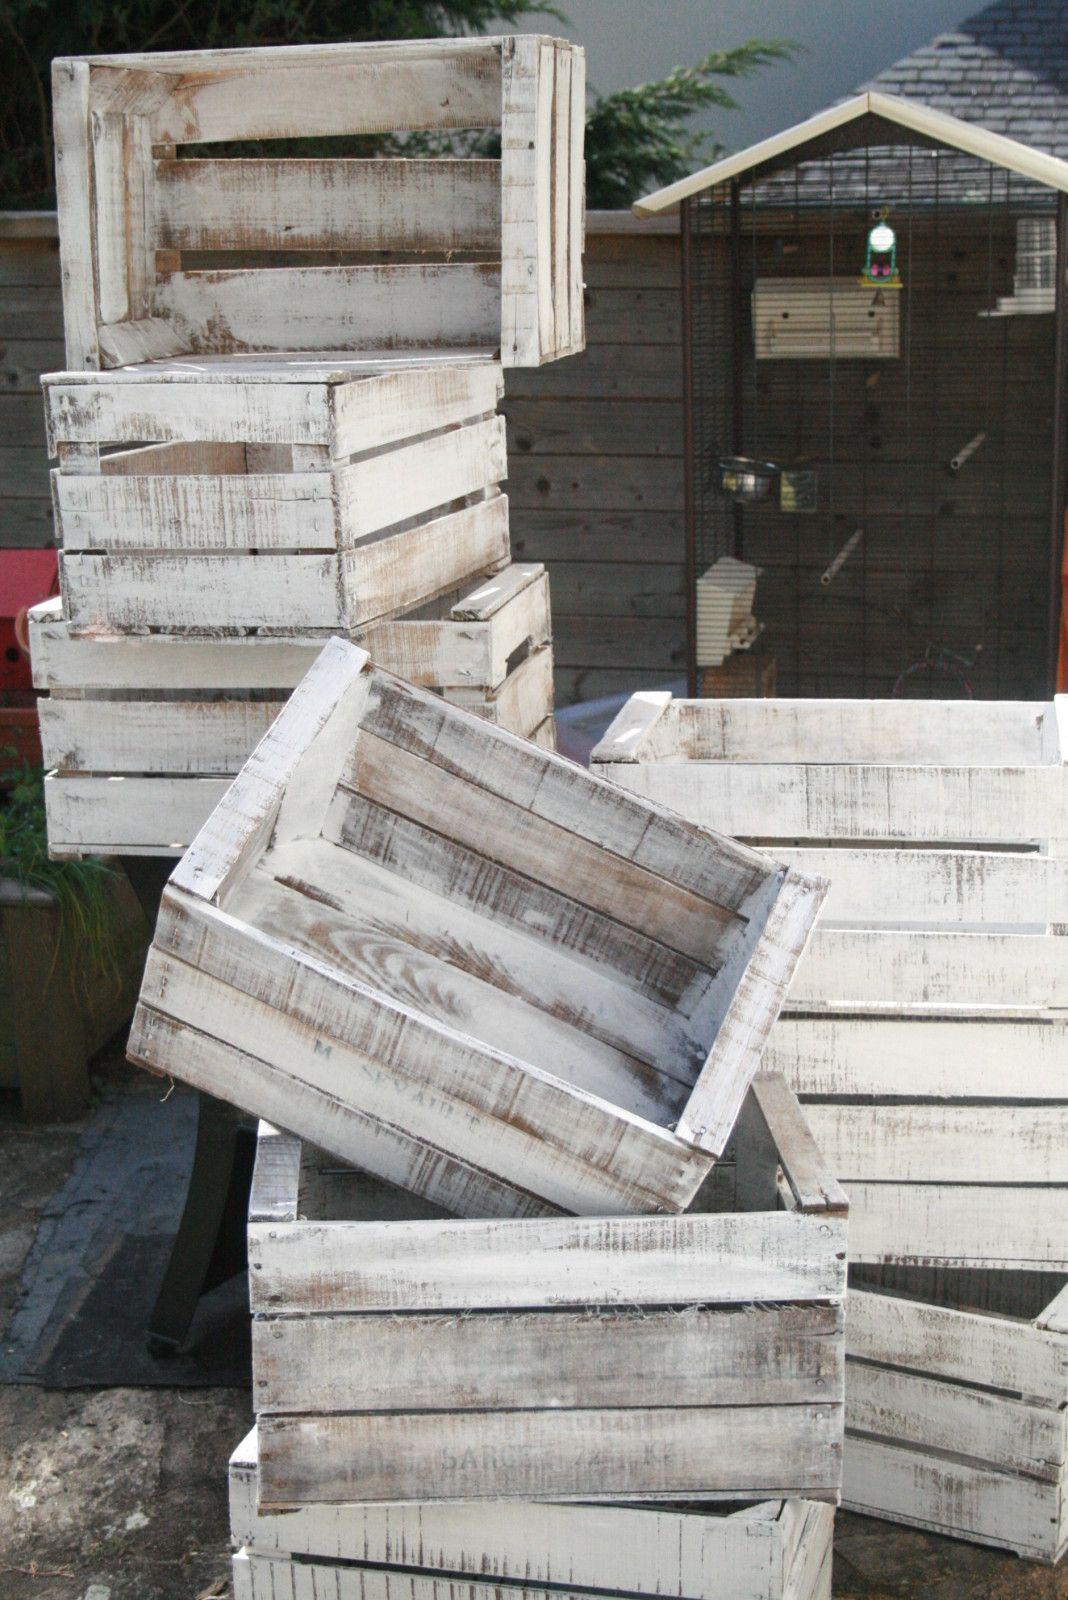 caisses pommes en 2019 meubels wood crates storage. Black Bedroom Furniture Sets. Home Design Ideas